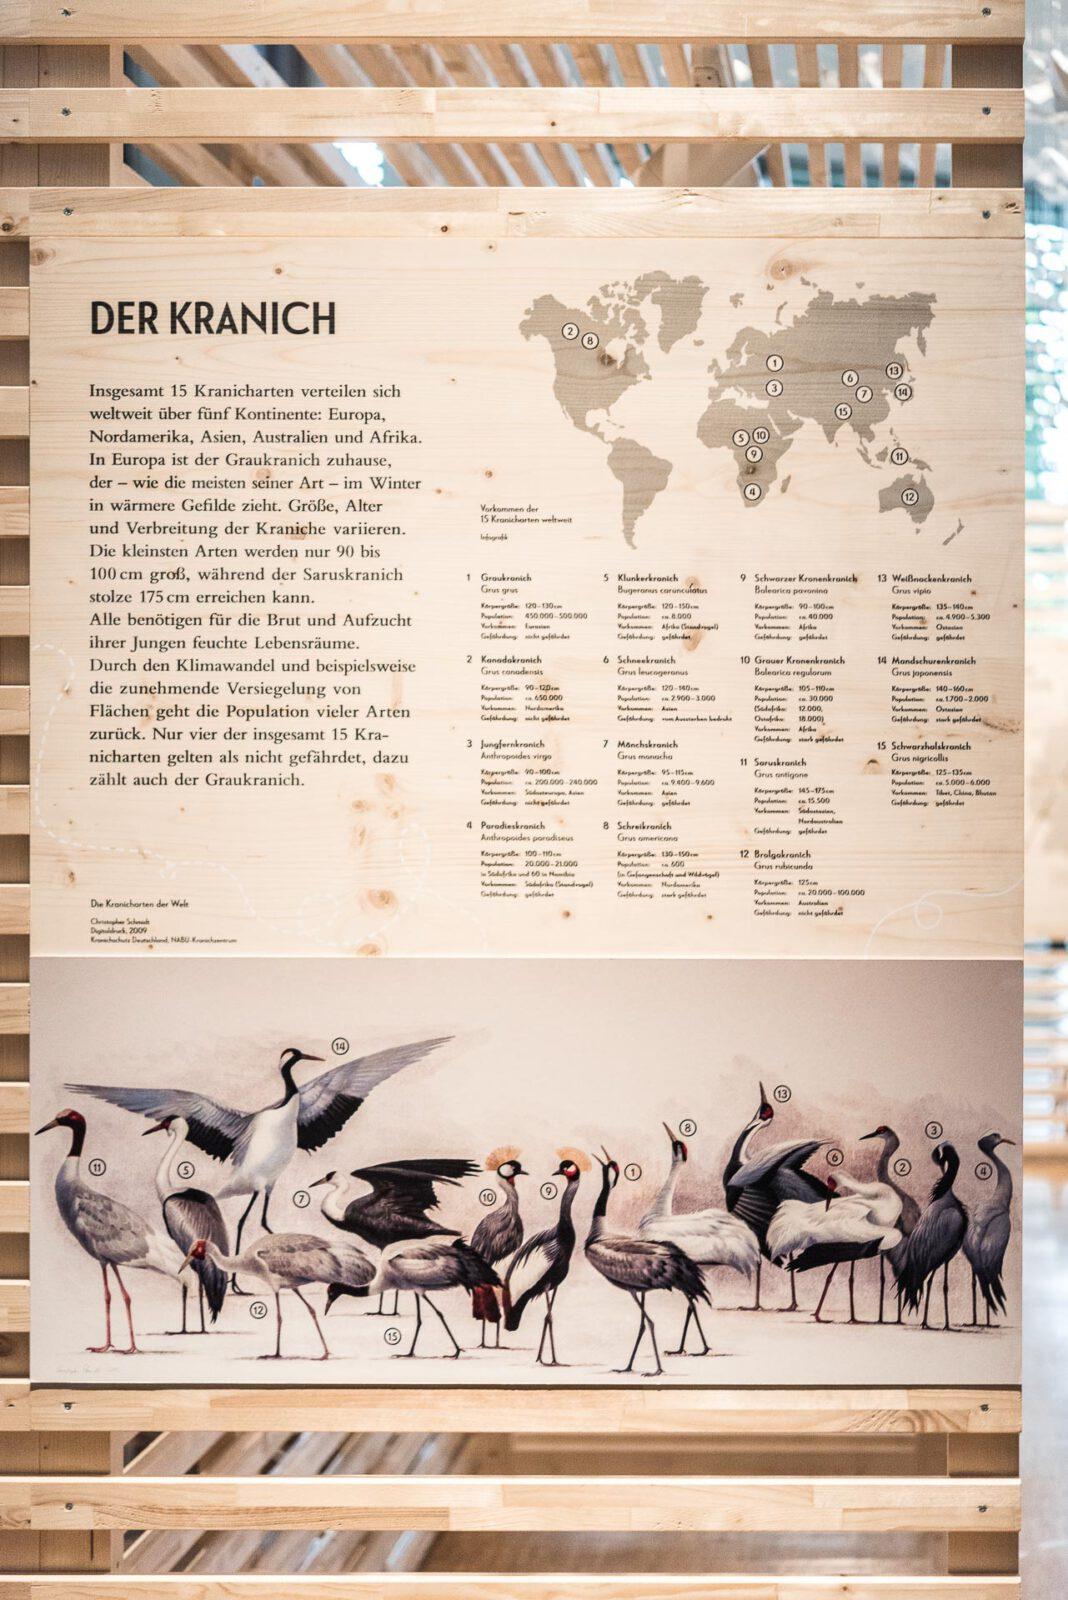 3_M_Kraniche_Schloss-Homburg_BOKG_02-11-2018_MFN1789